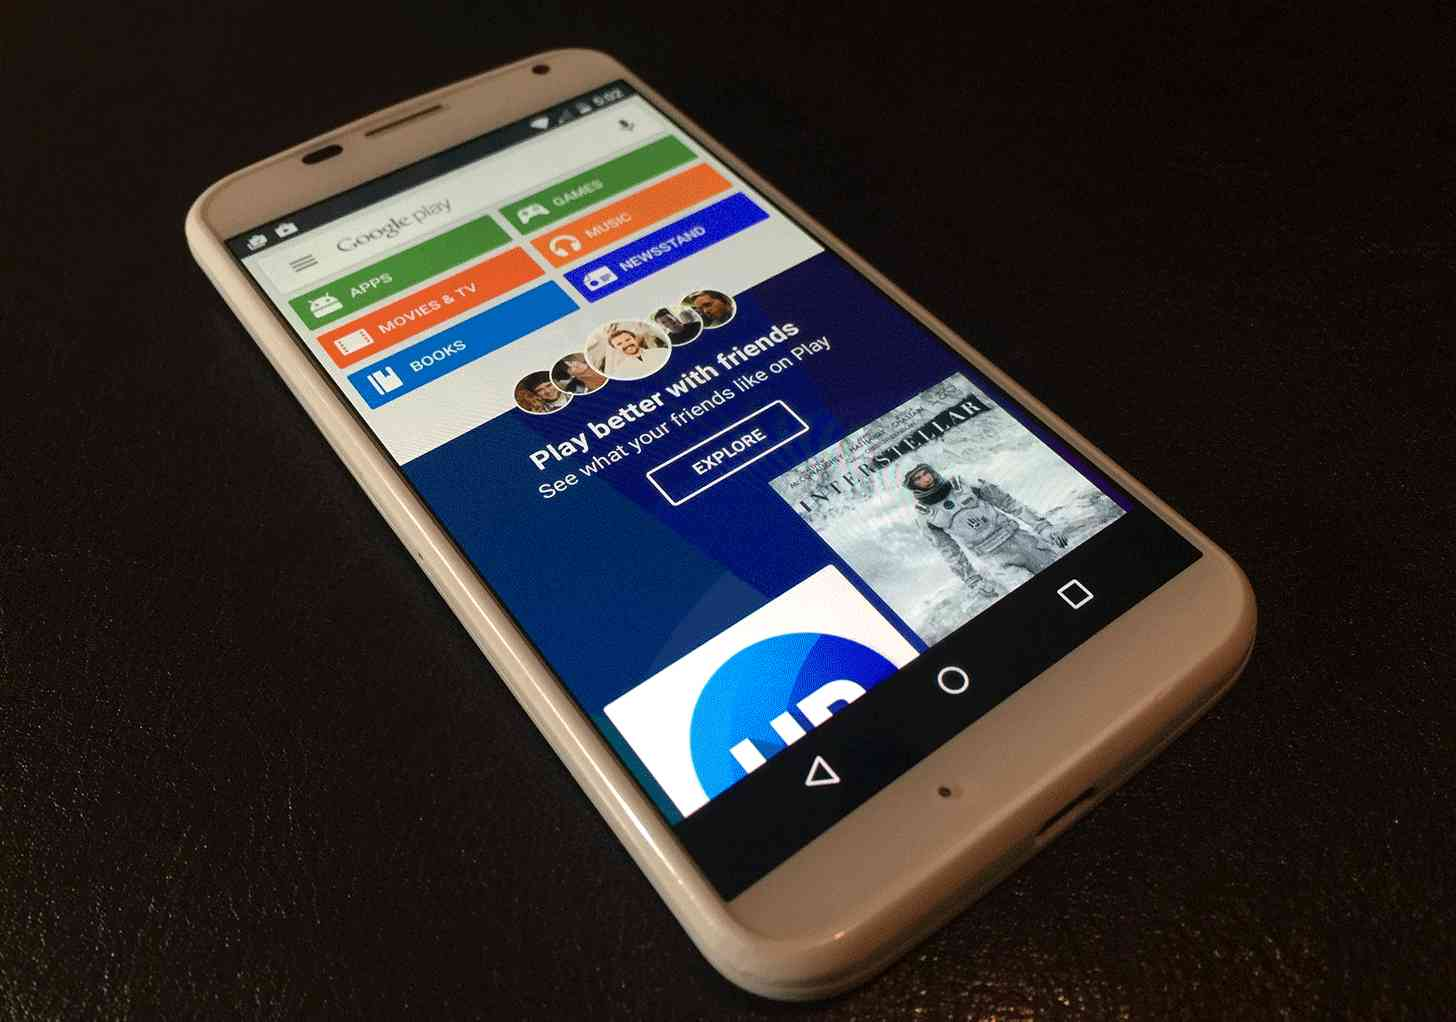 Moto X Google Play